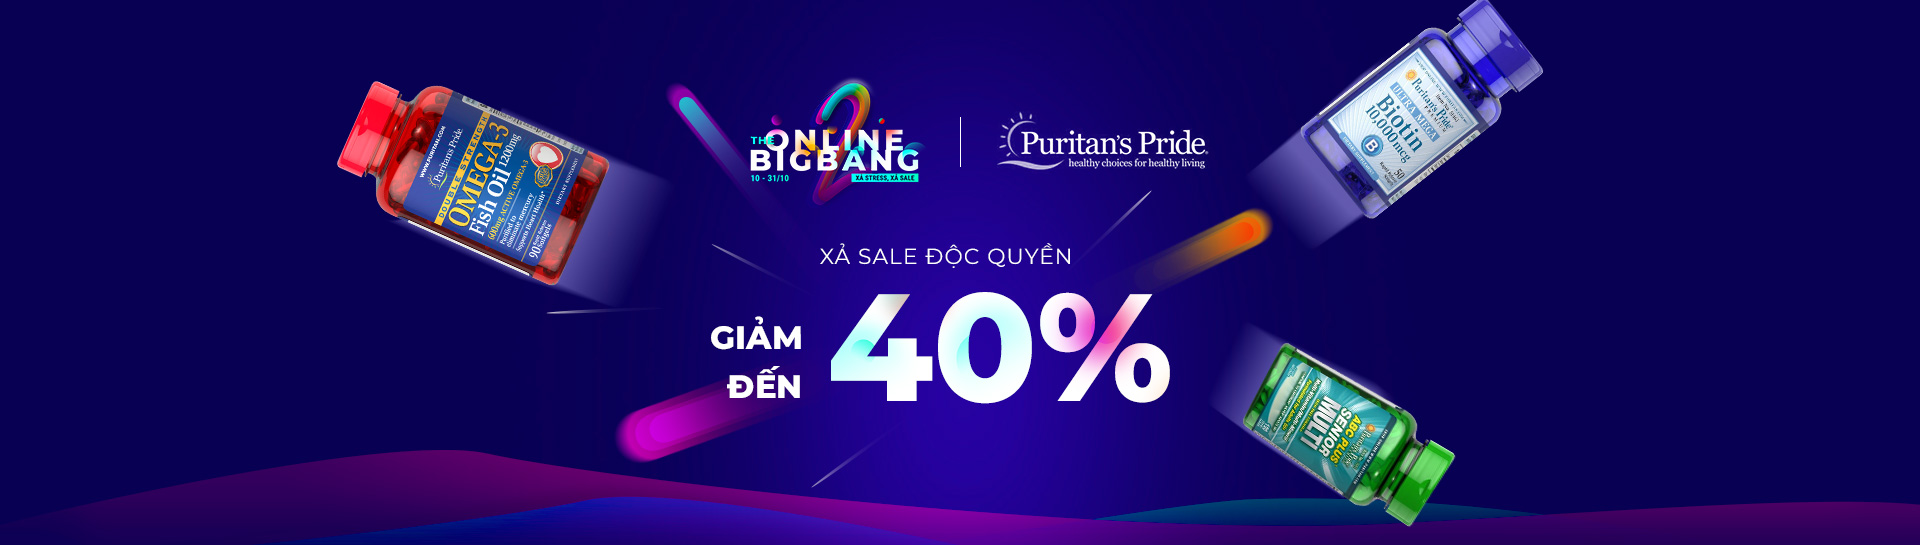 Puritan's Pride - Giảm giá đến 40%